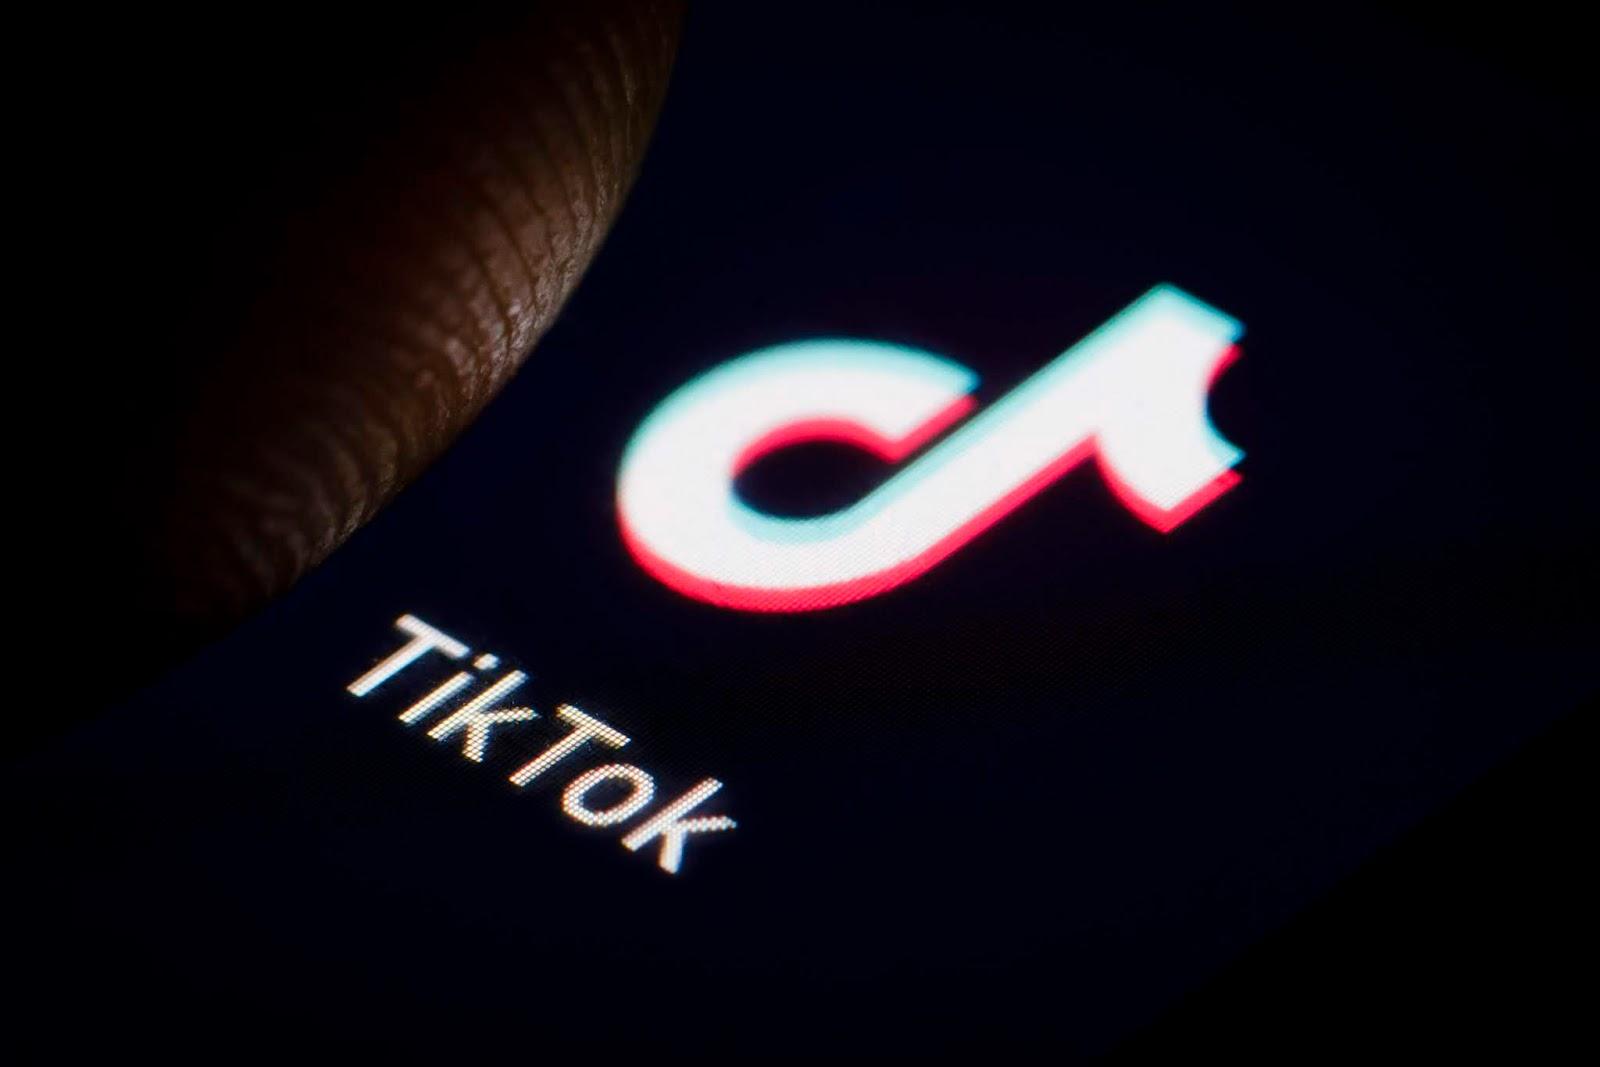 Popular social media app TikTok donates a hefty amount to those affected by Coronavirus